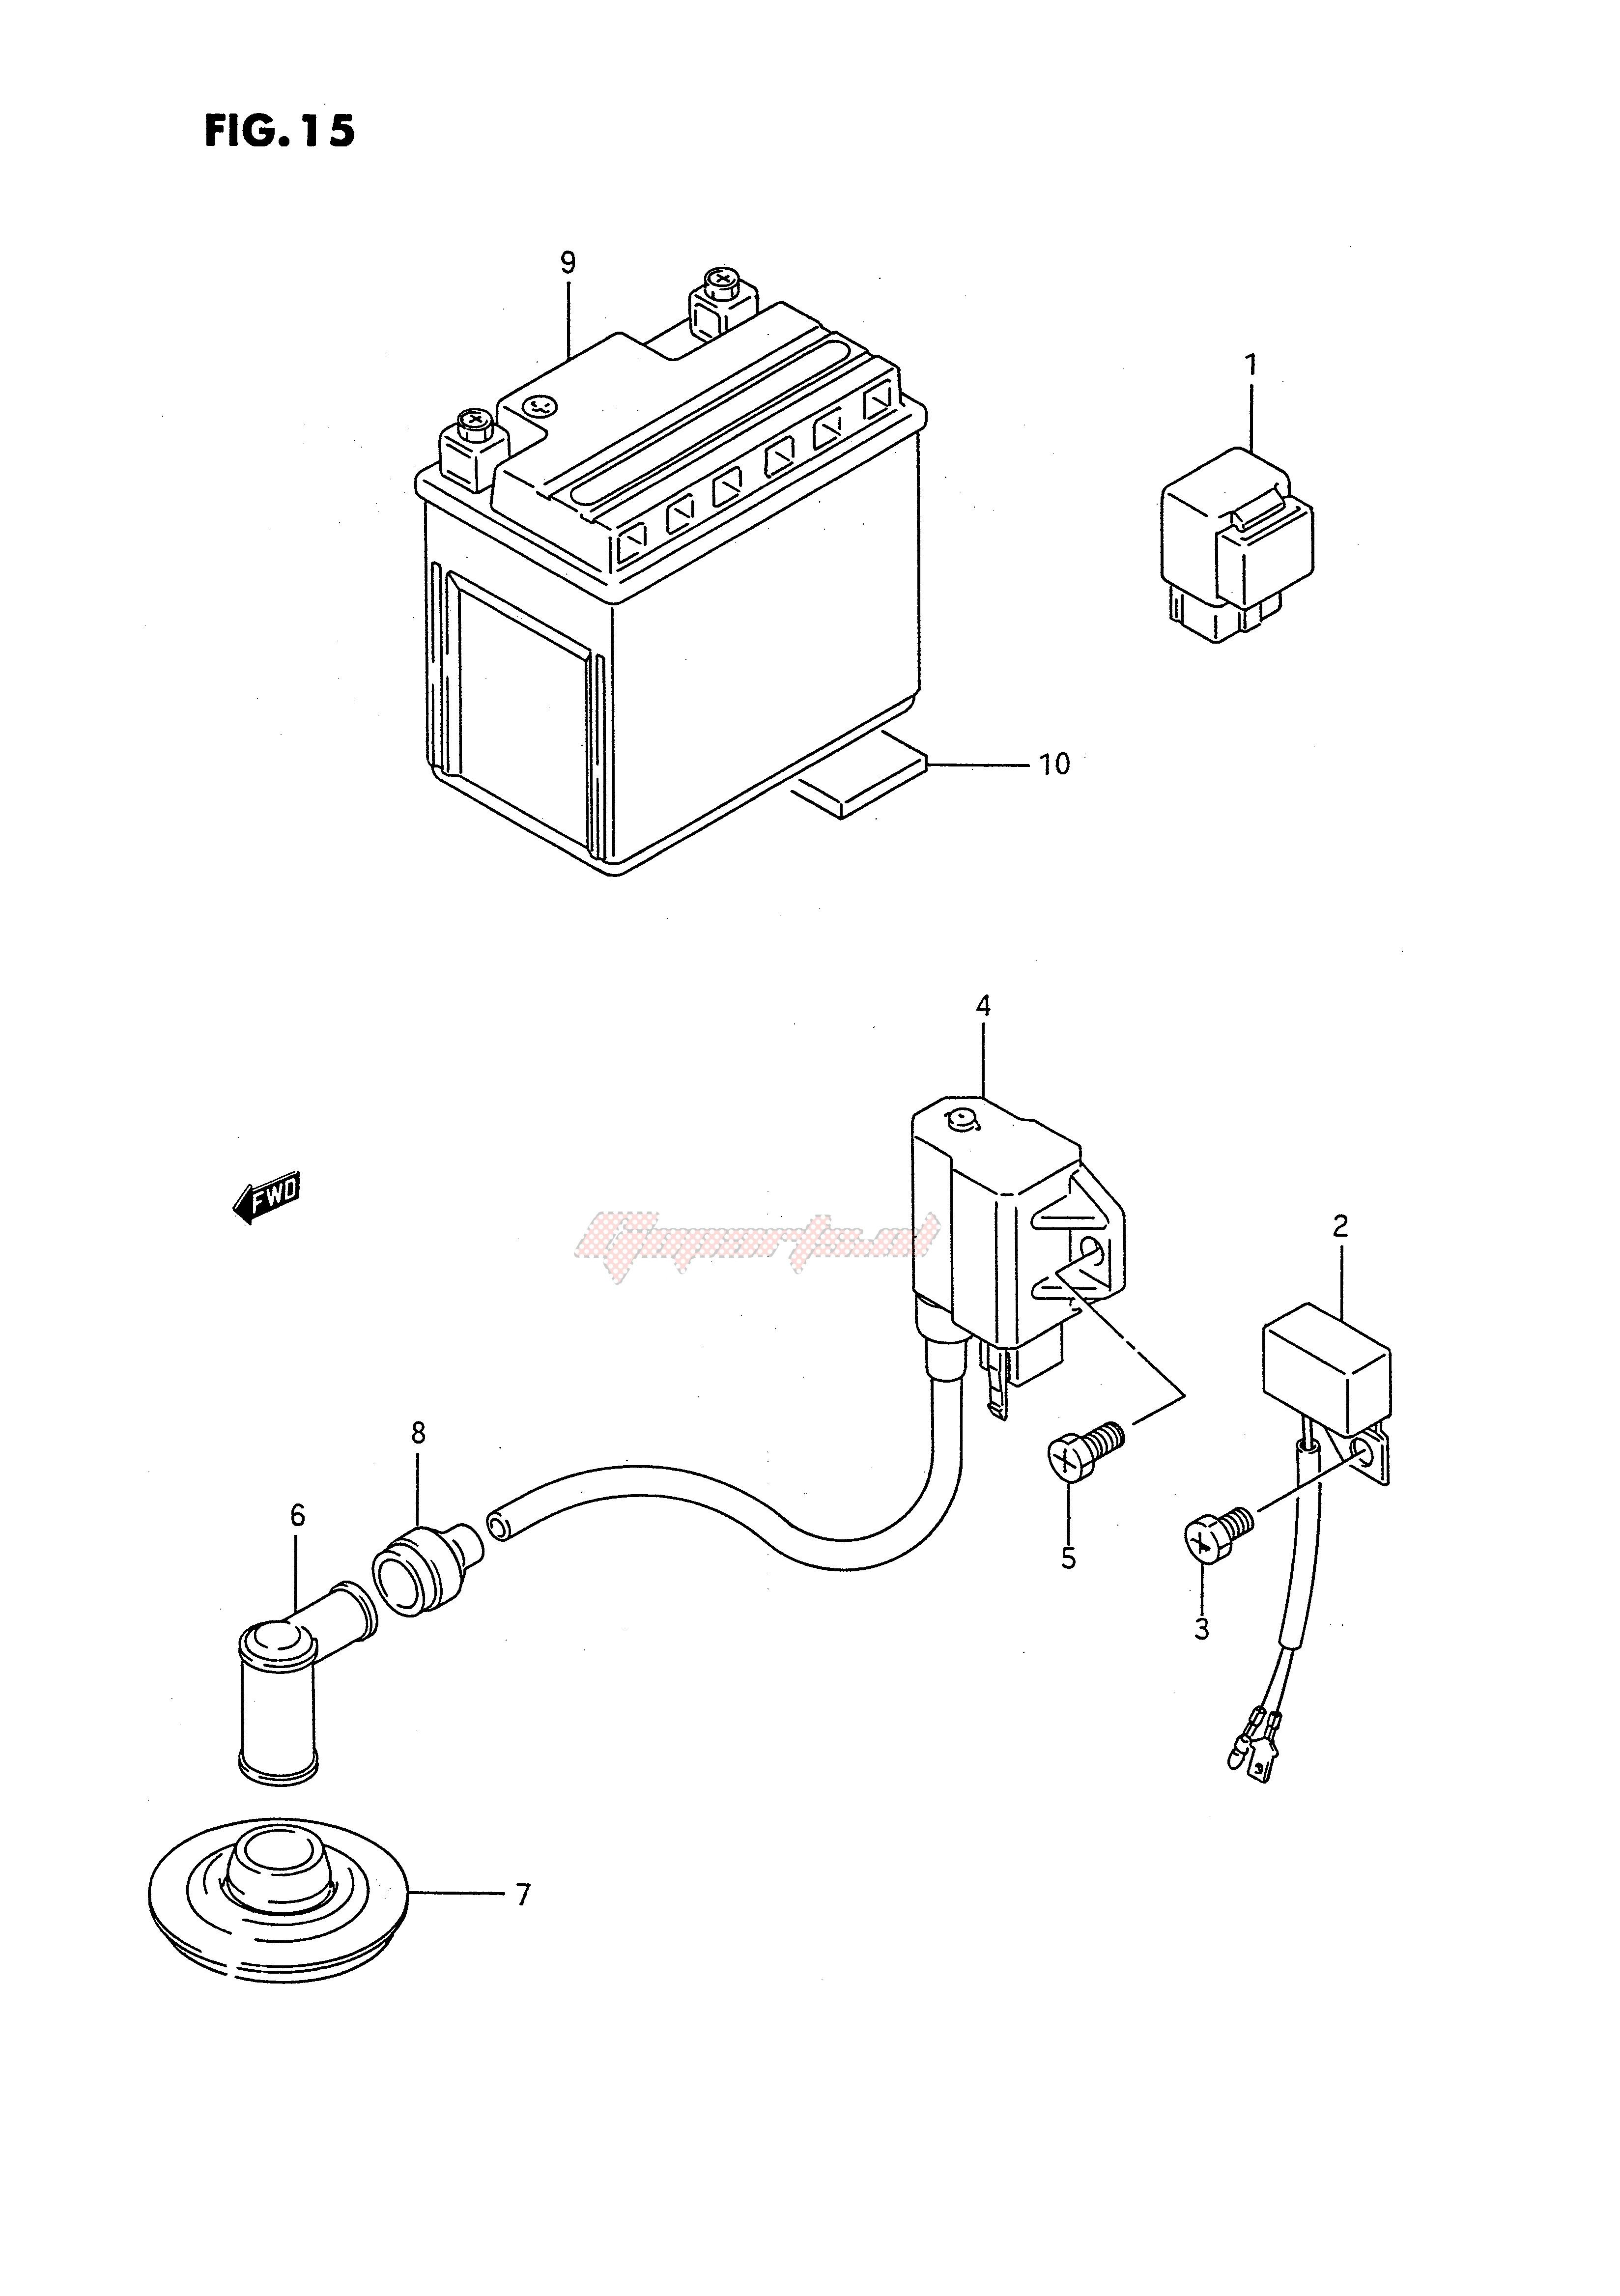 2007 baja 250 quad wiring diagram suzuki lt 300 wiring diagram e5 wiring diagram  suzuki lt 300 wiring diagram e5